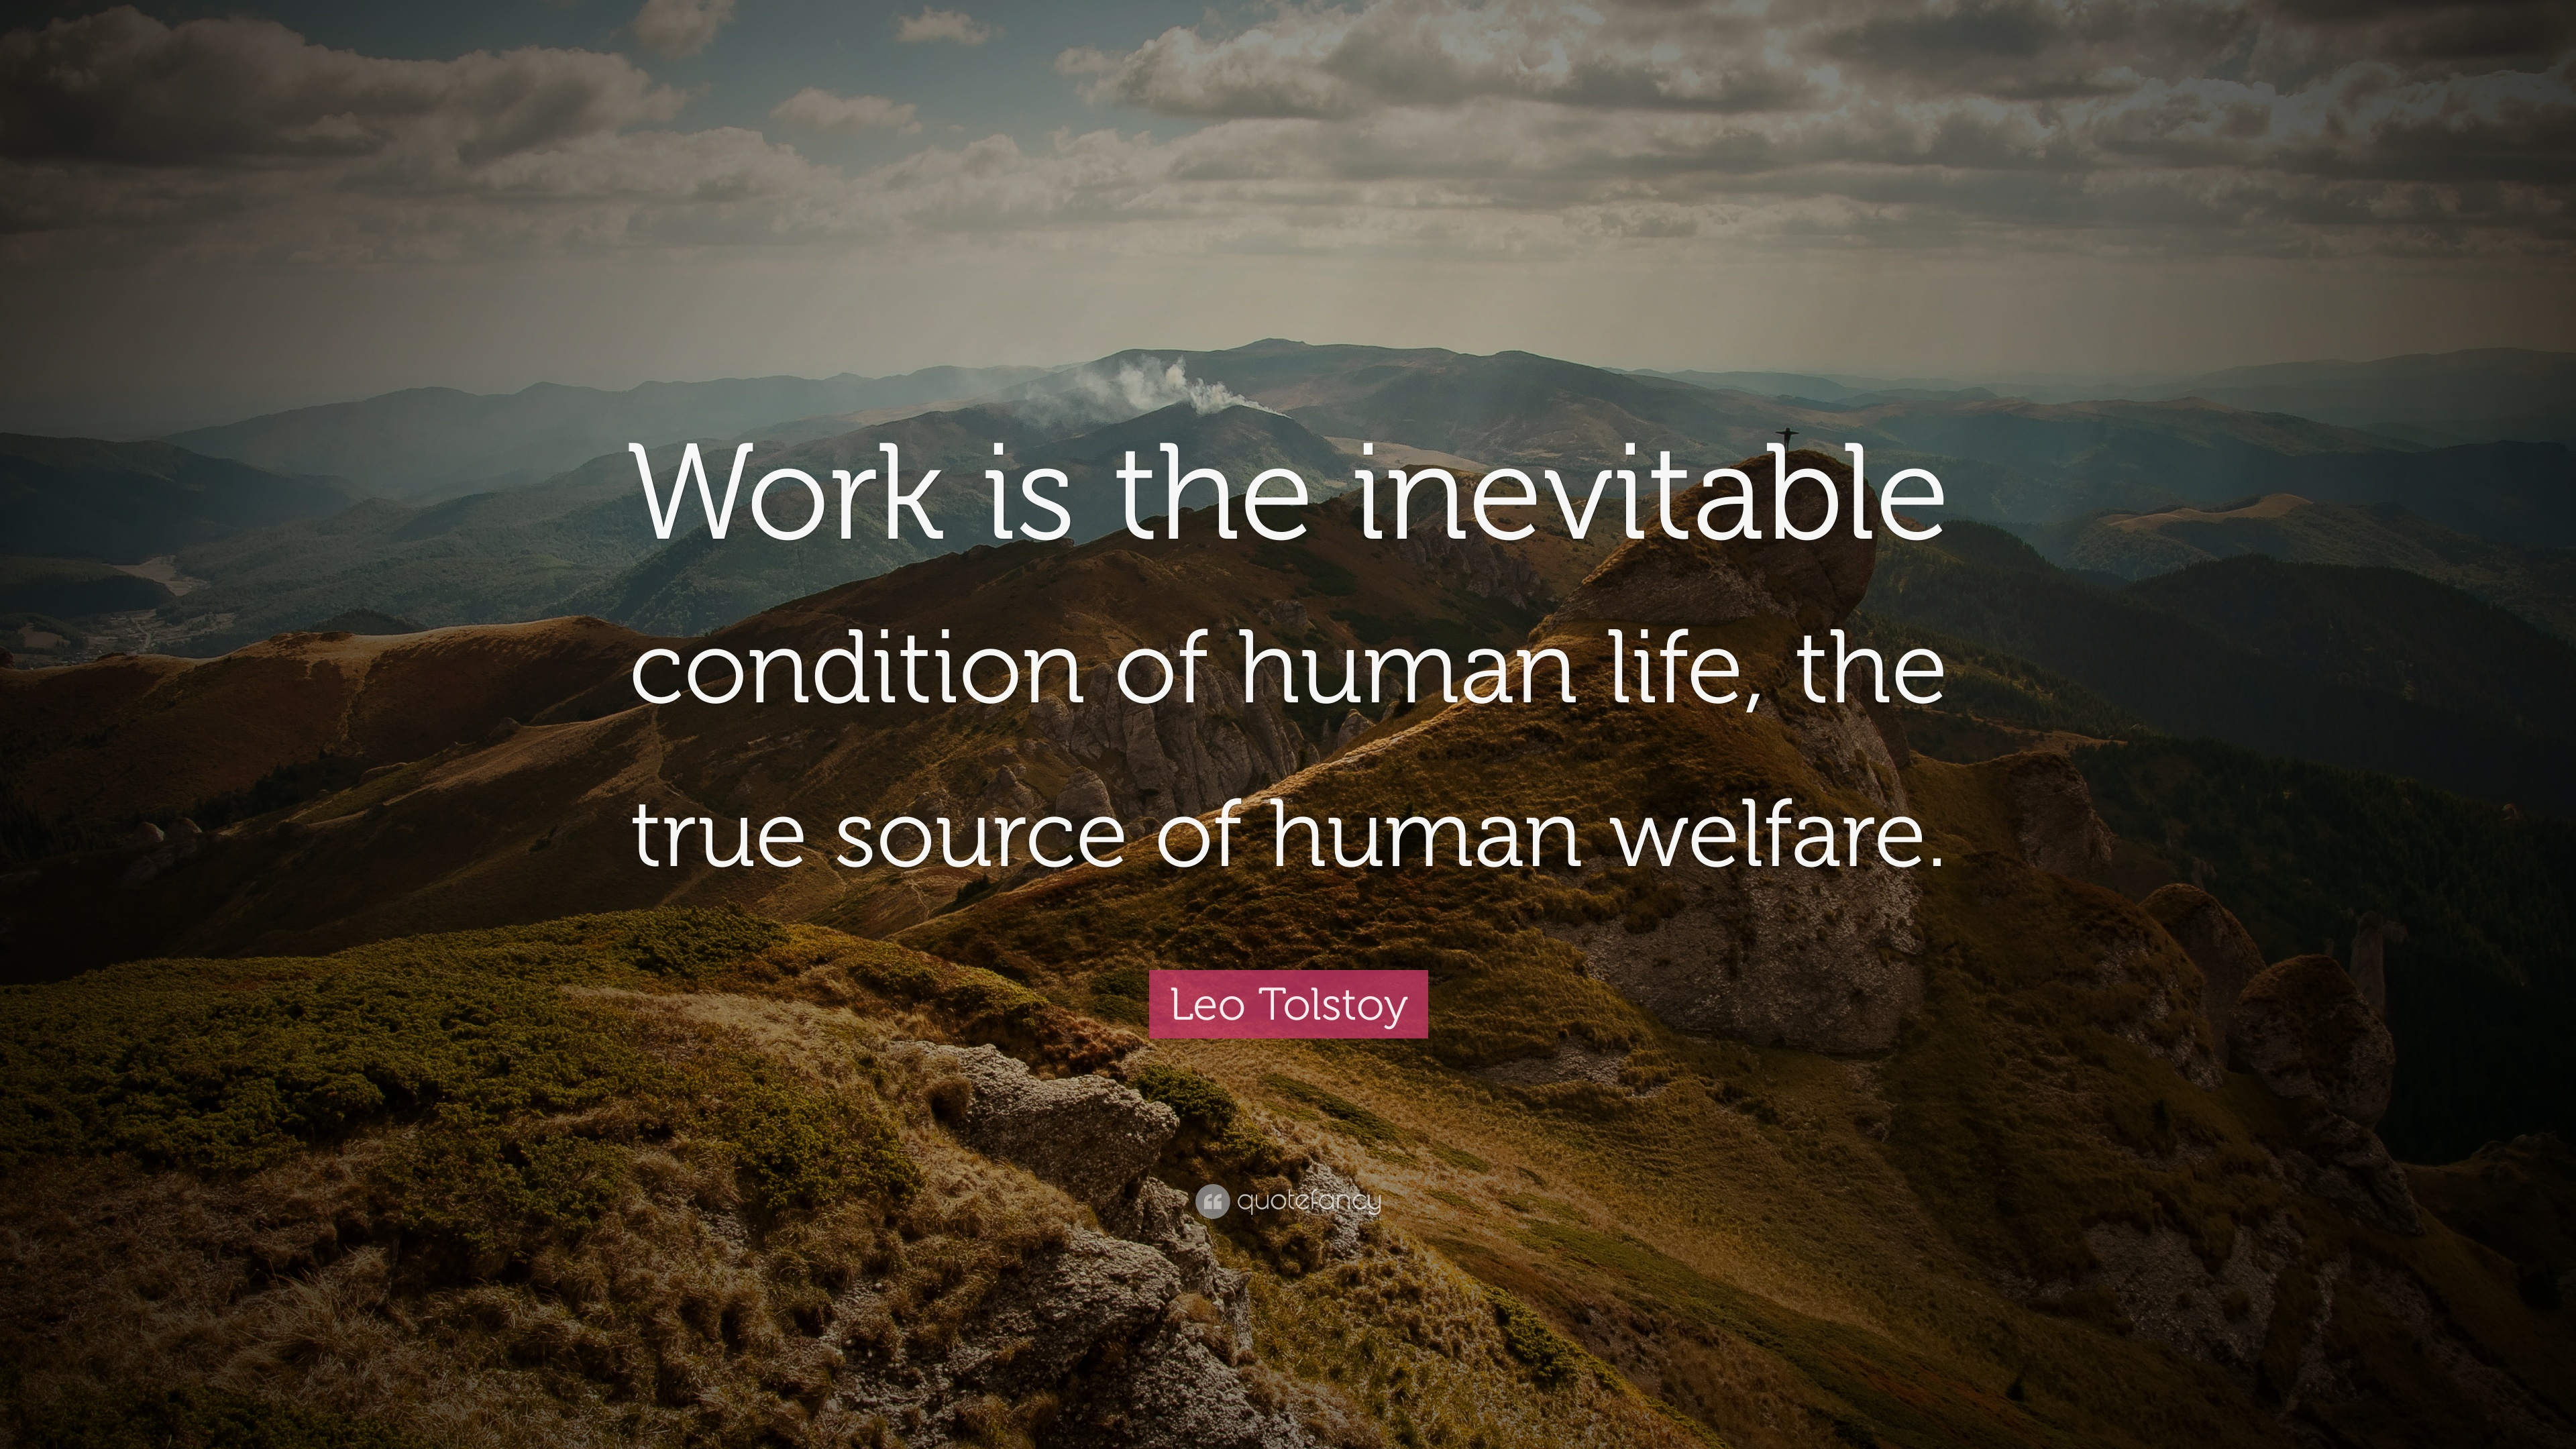 Human Welfare Quotes Twitter thumbnail